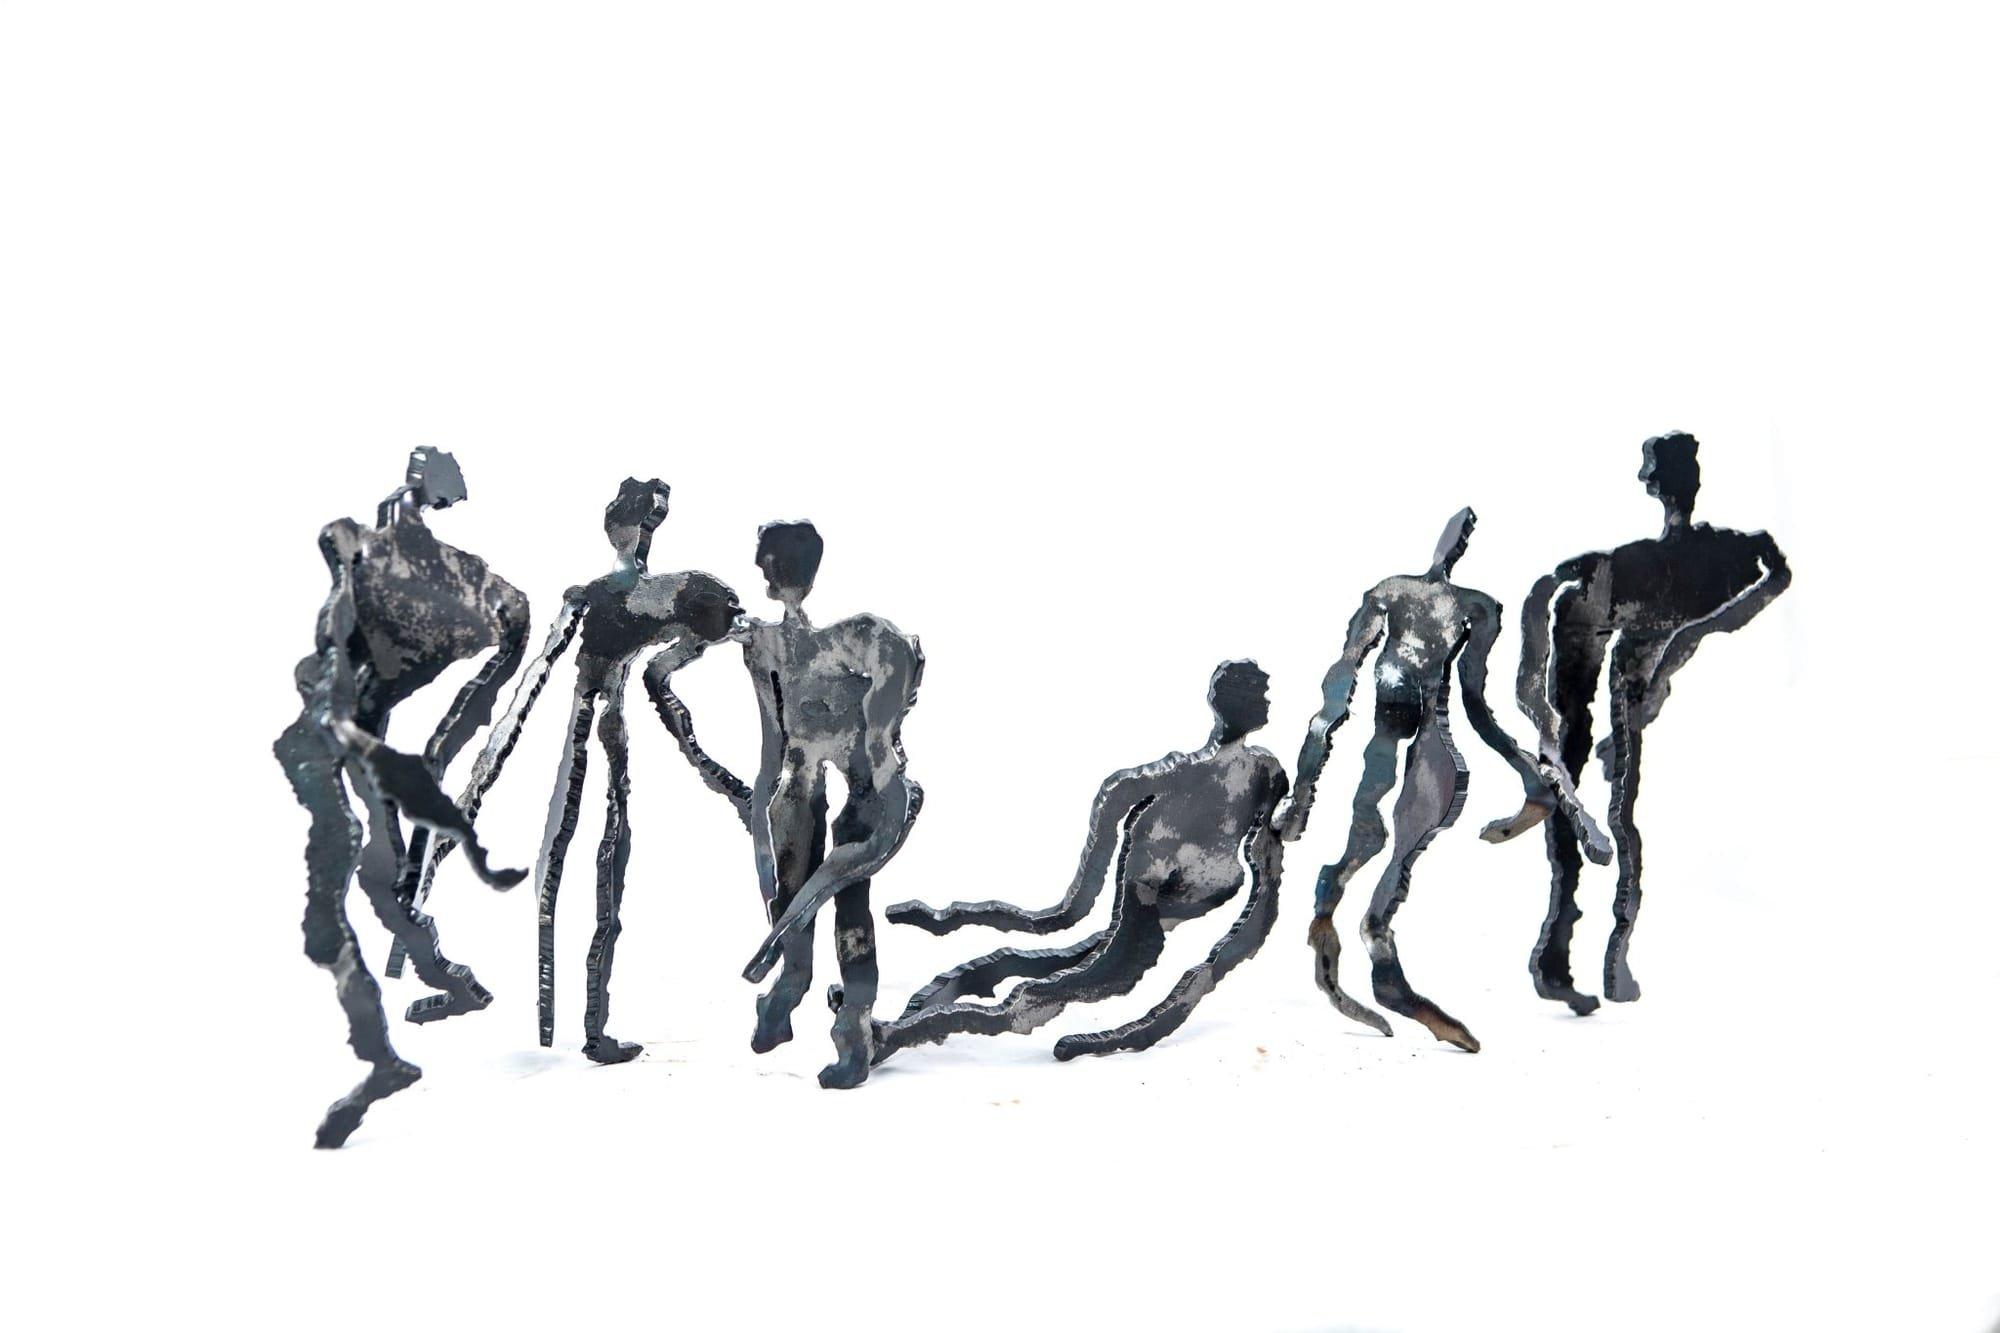 The Way to VII | 2017 | Iron | 26x60x16 cm | Rami Ater